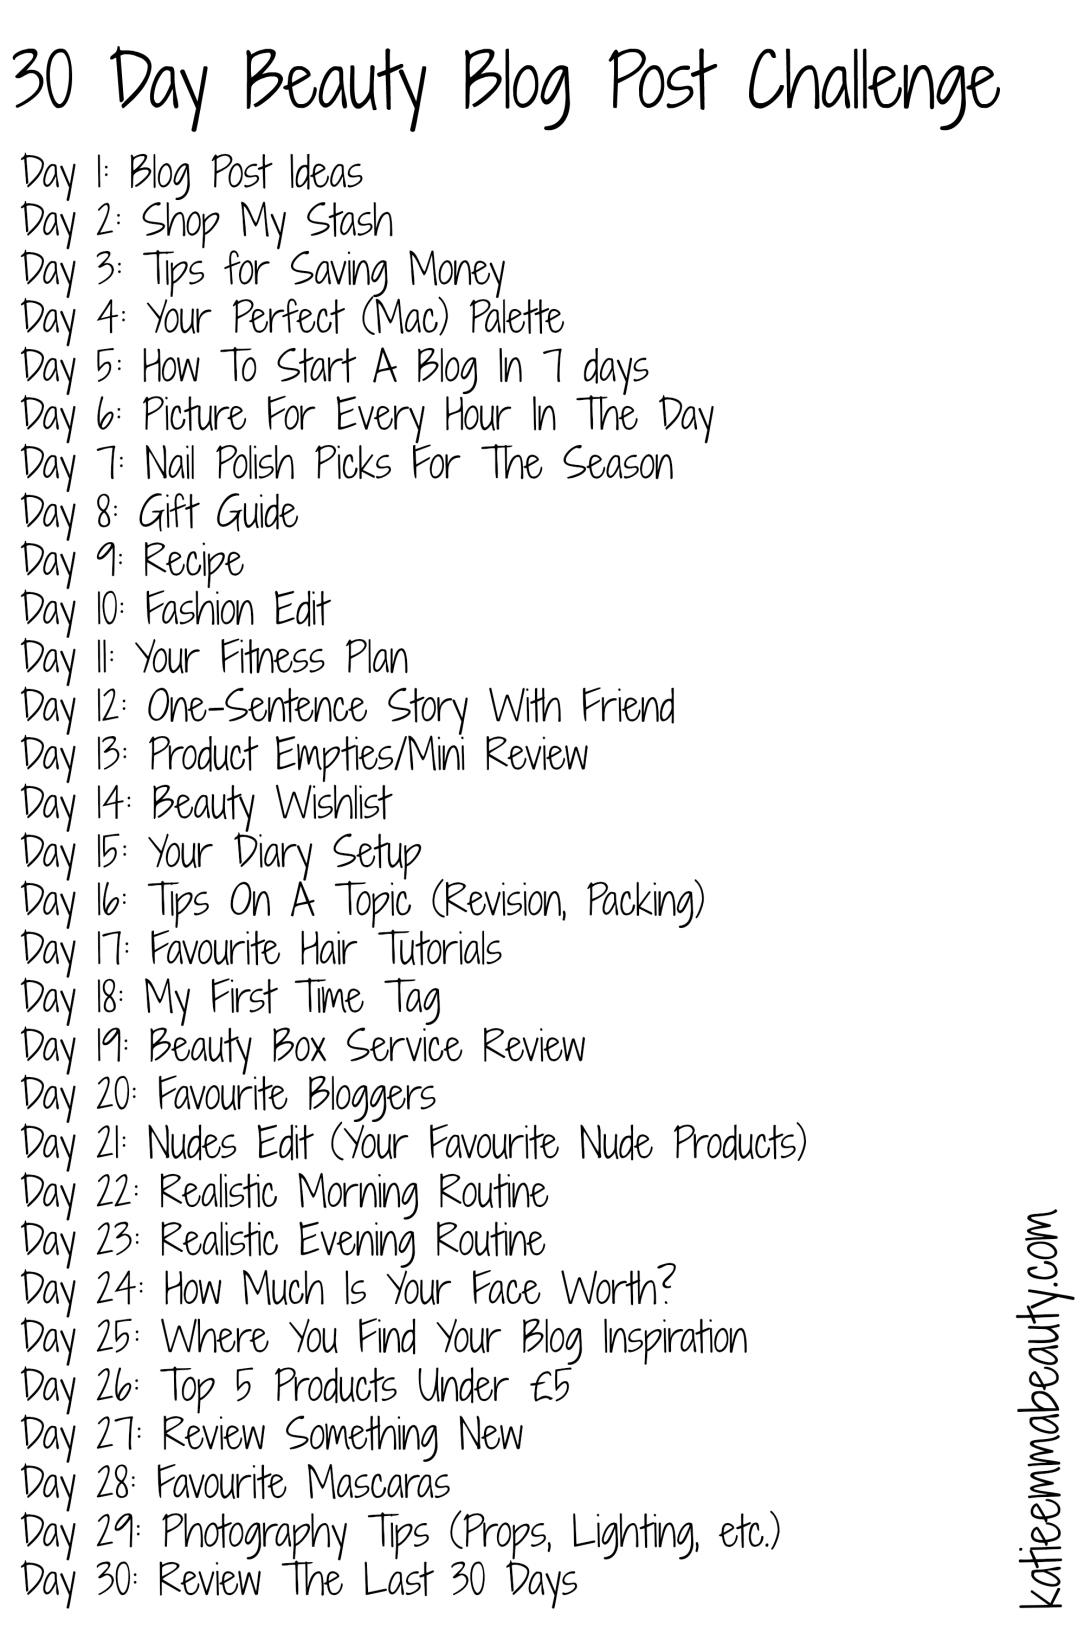 30 Day Beauty Blog Post Challenge